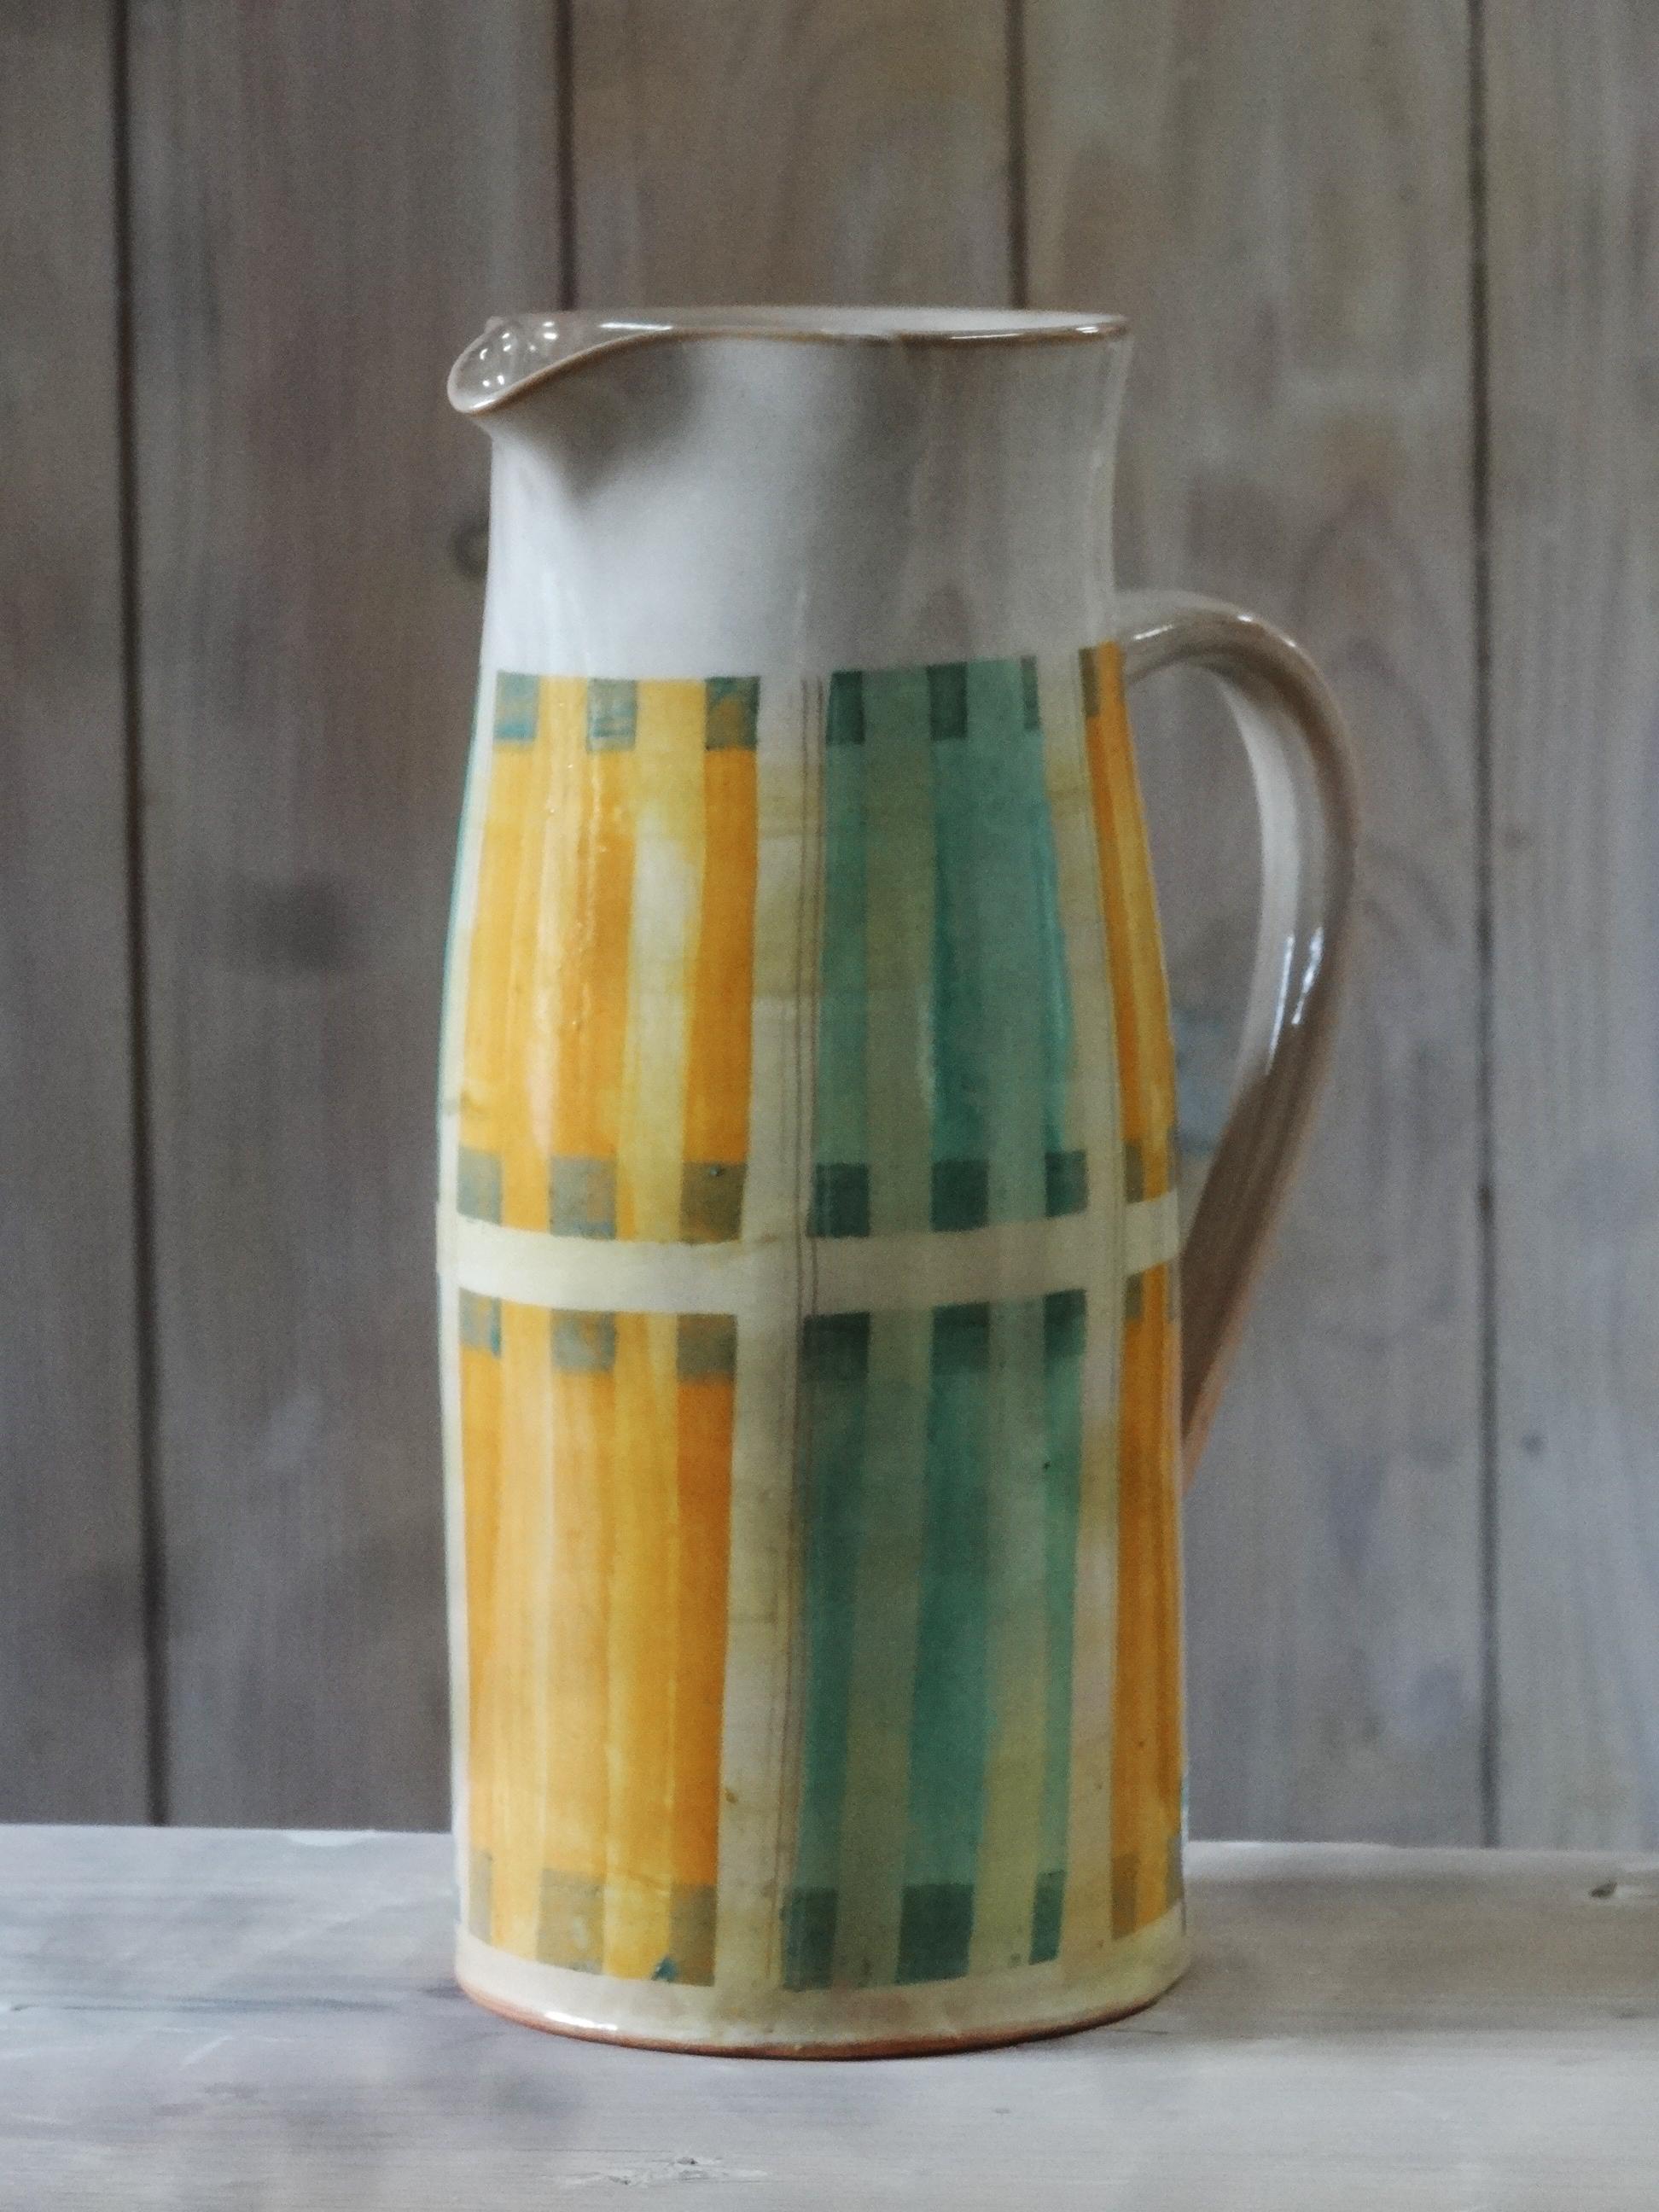 Dekor gewebte kastl orange-grün Kopie heller